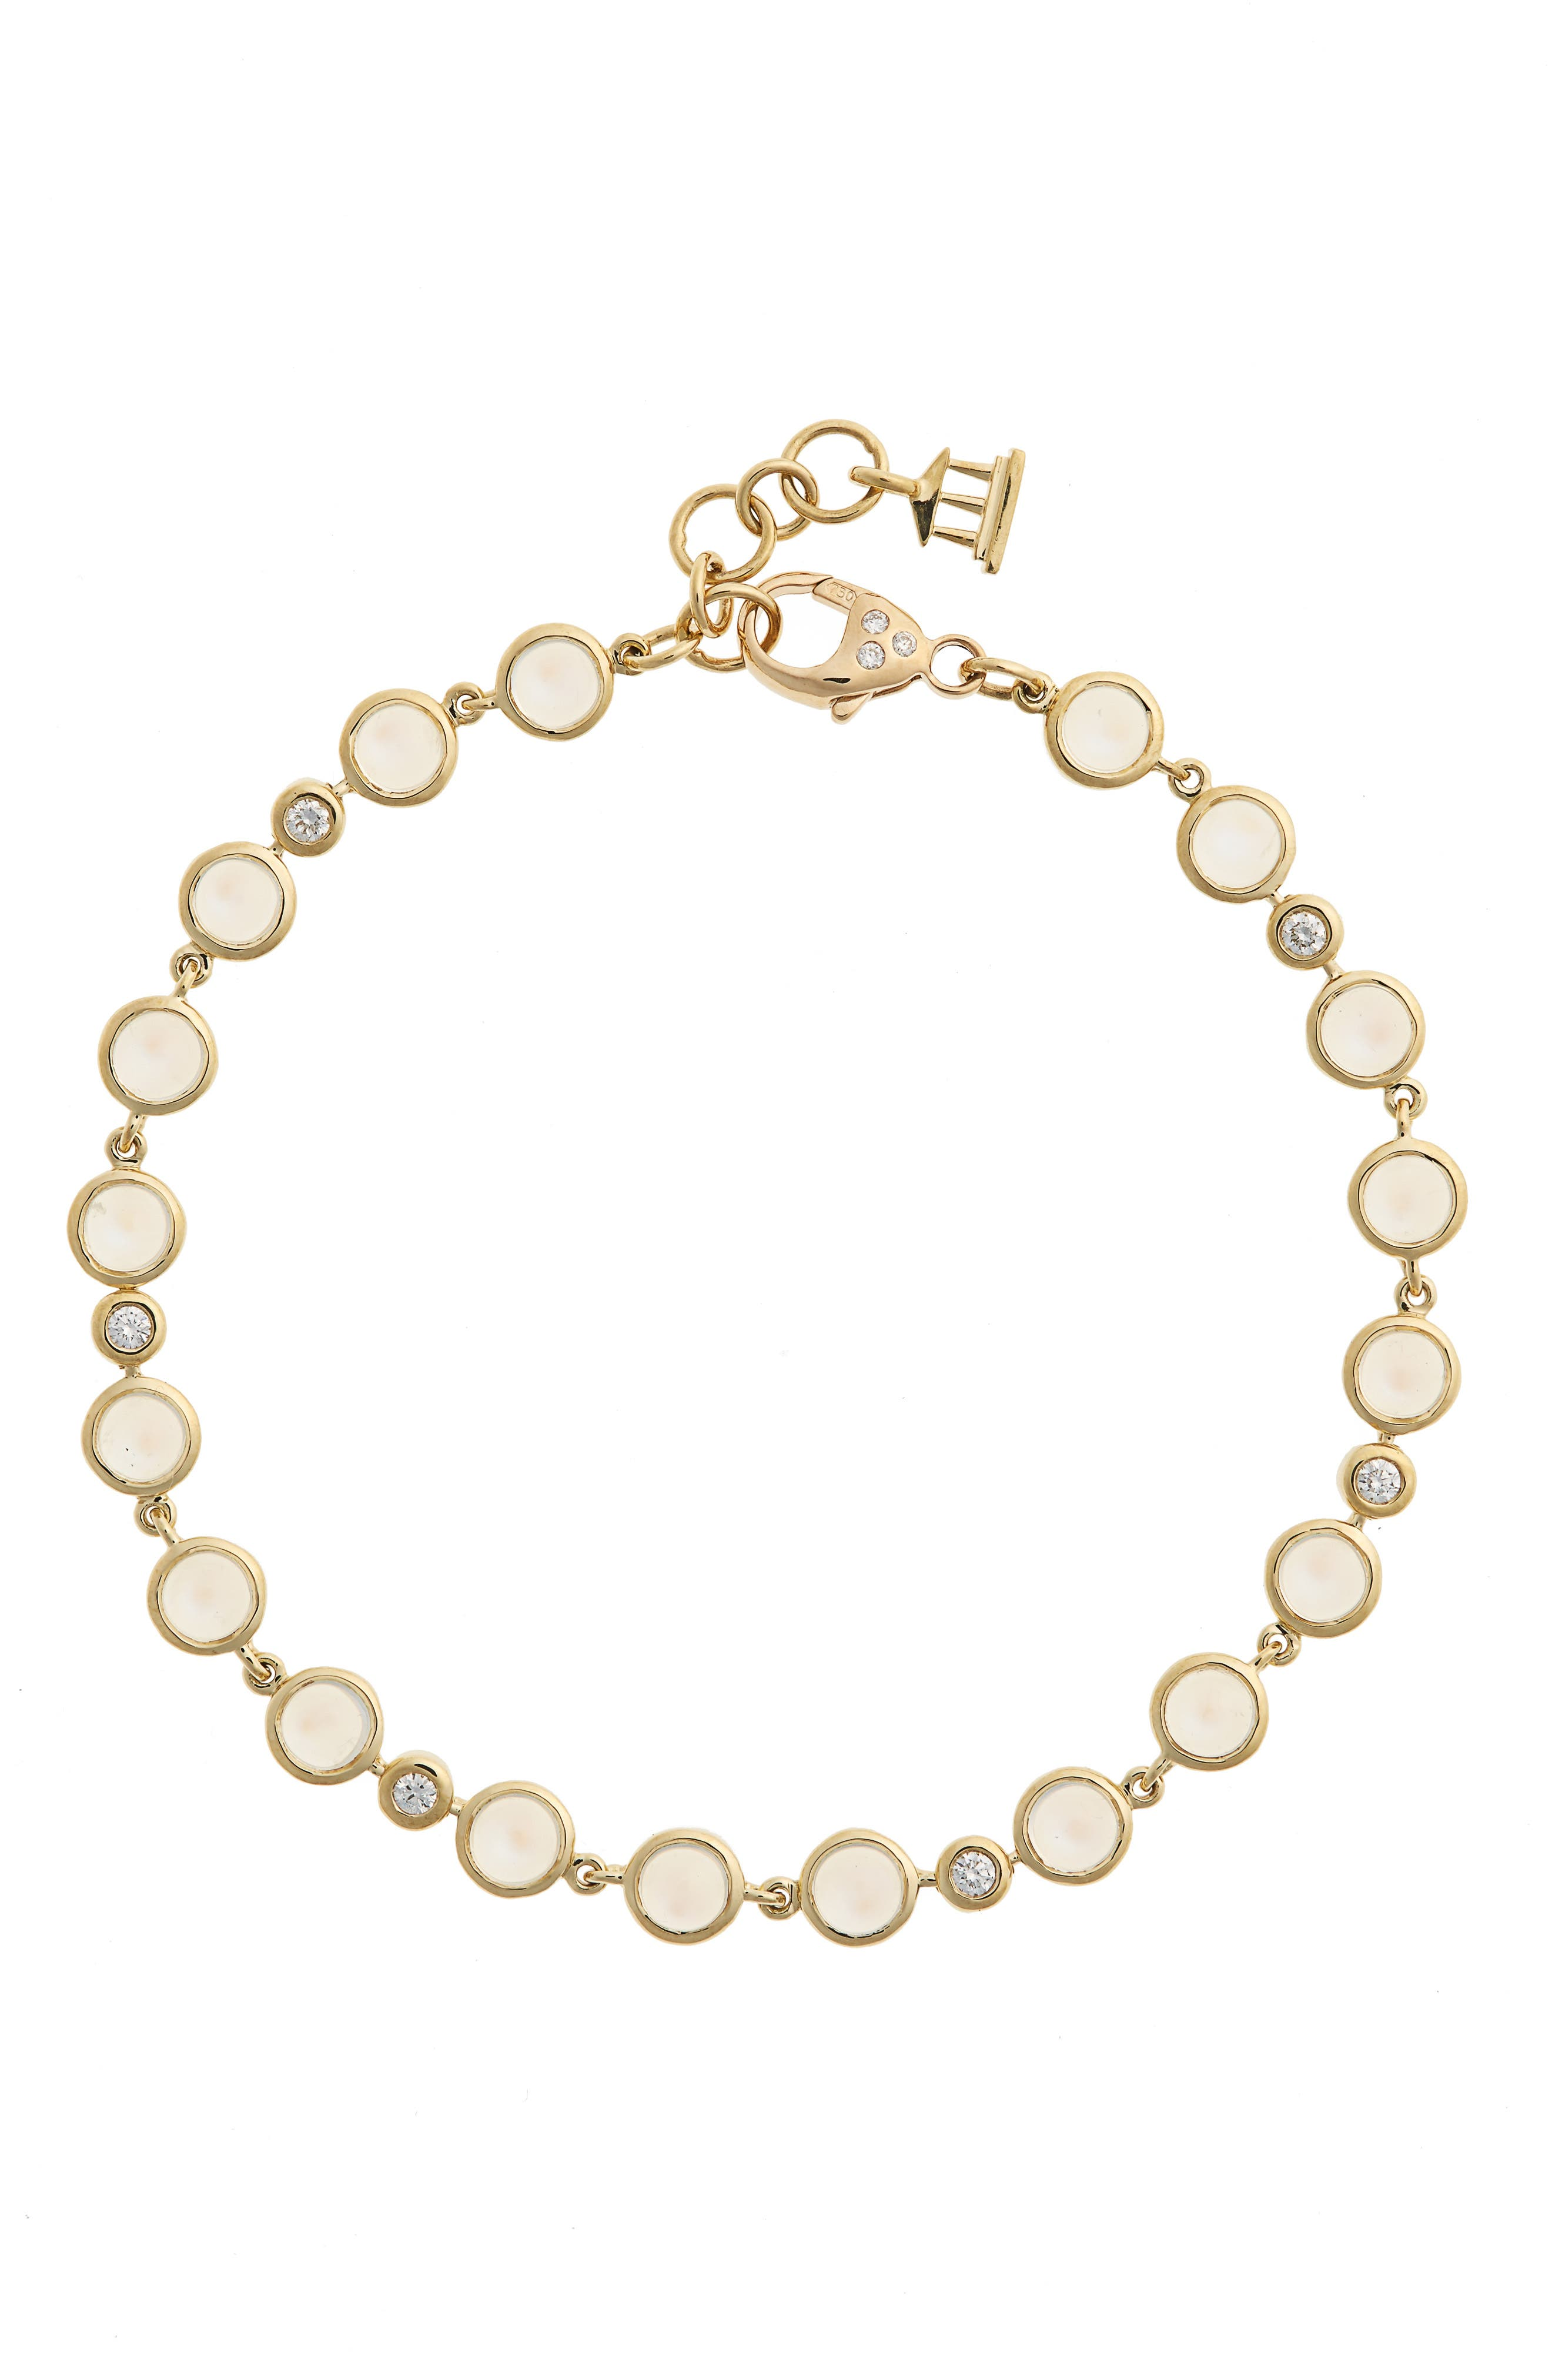 Temple St. Clair Diamond & Moonstone Bracelet,                         Main,                         color, YELLOW GOLD/ BLUE MOONSTONE